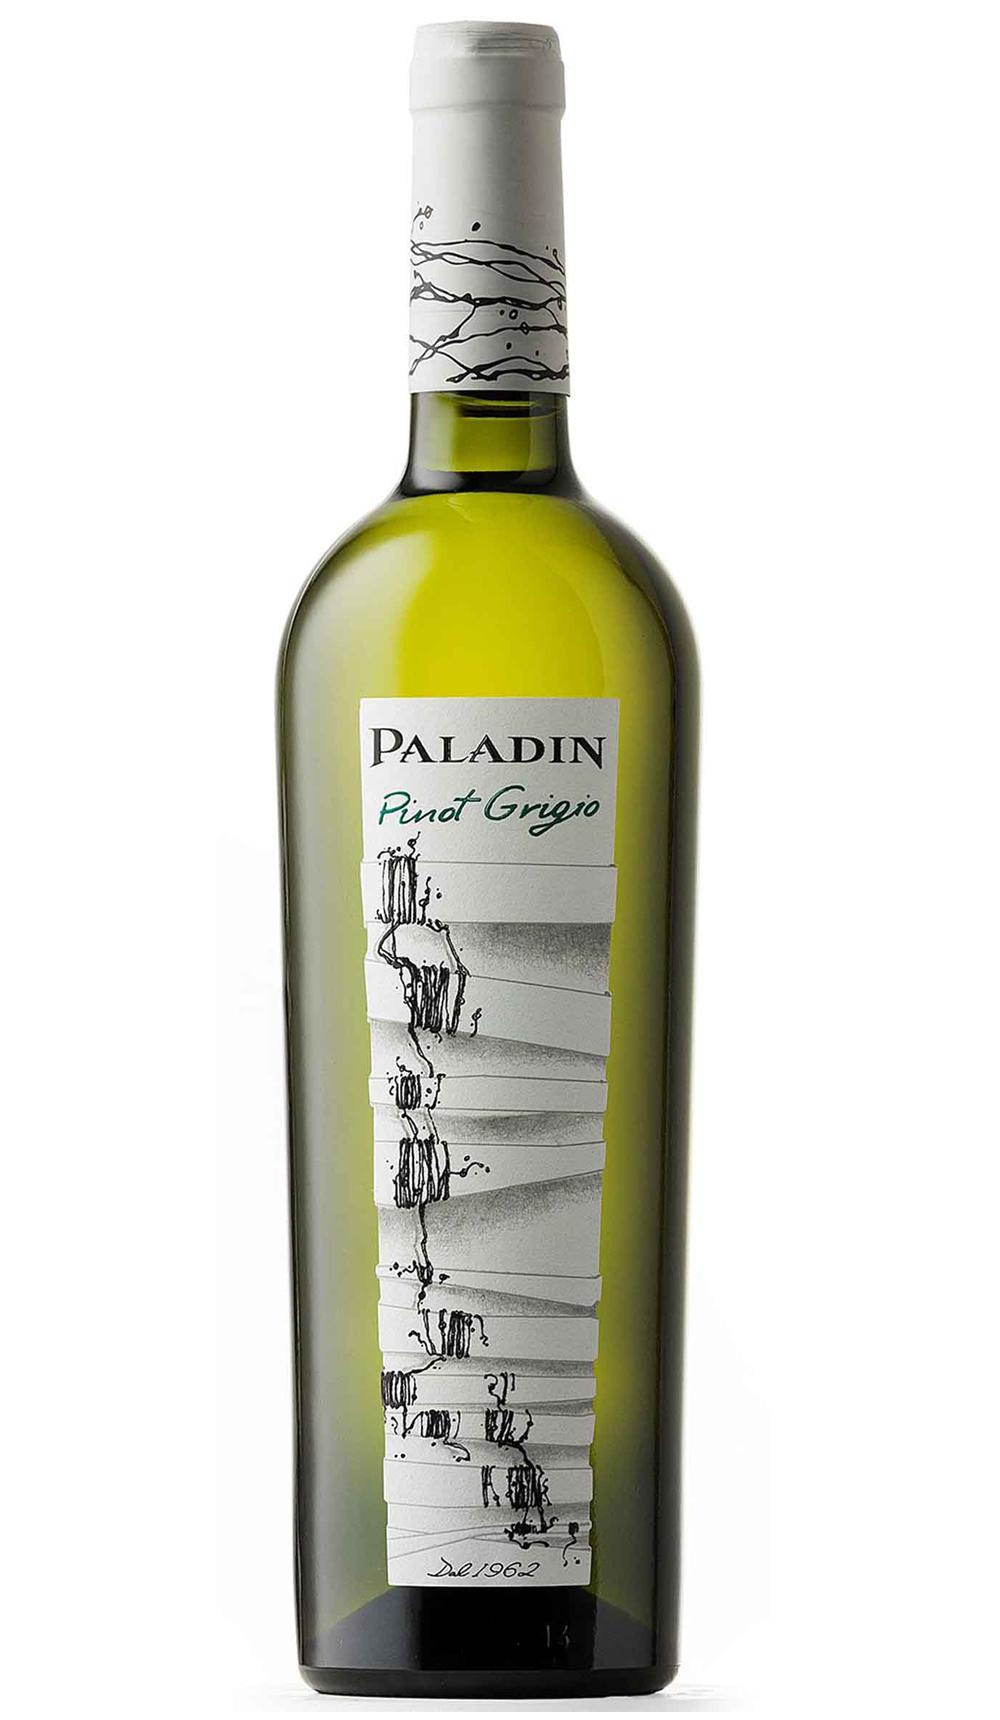 Paladin-Pinot-Grigio